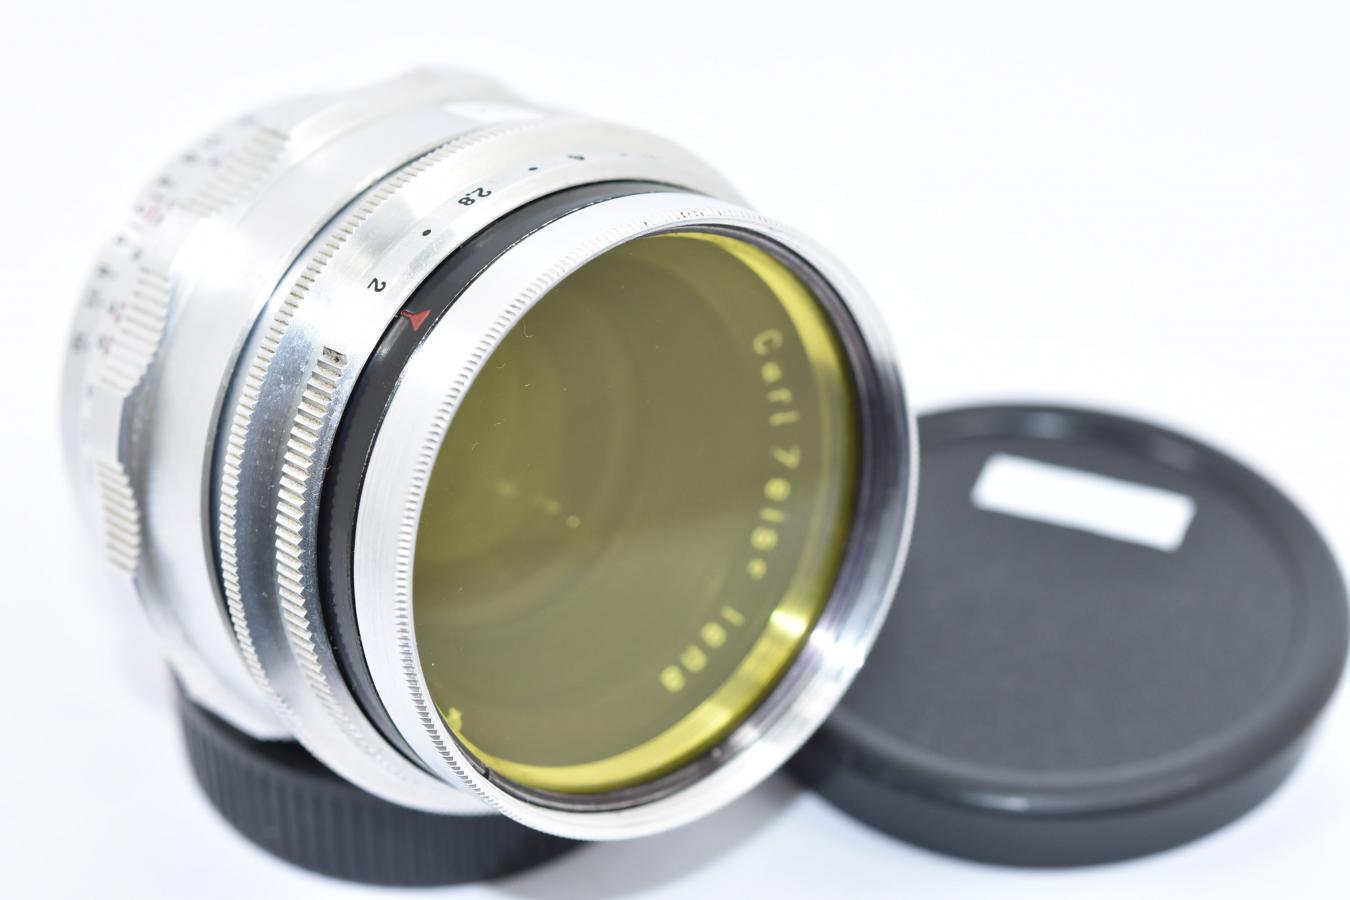 Carl Zeiss Jena Biotar 58mm F2 【イエローフィルター付 カメラ女子に絶大な人気のオールドレンズ M42マウントレンズ】